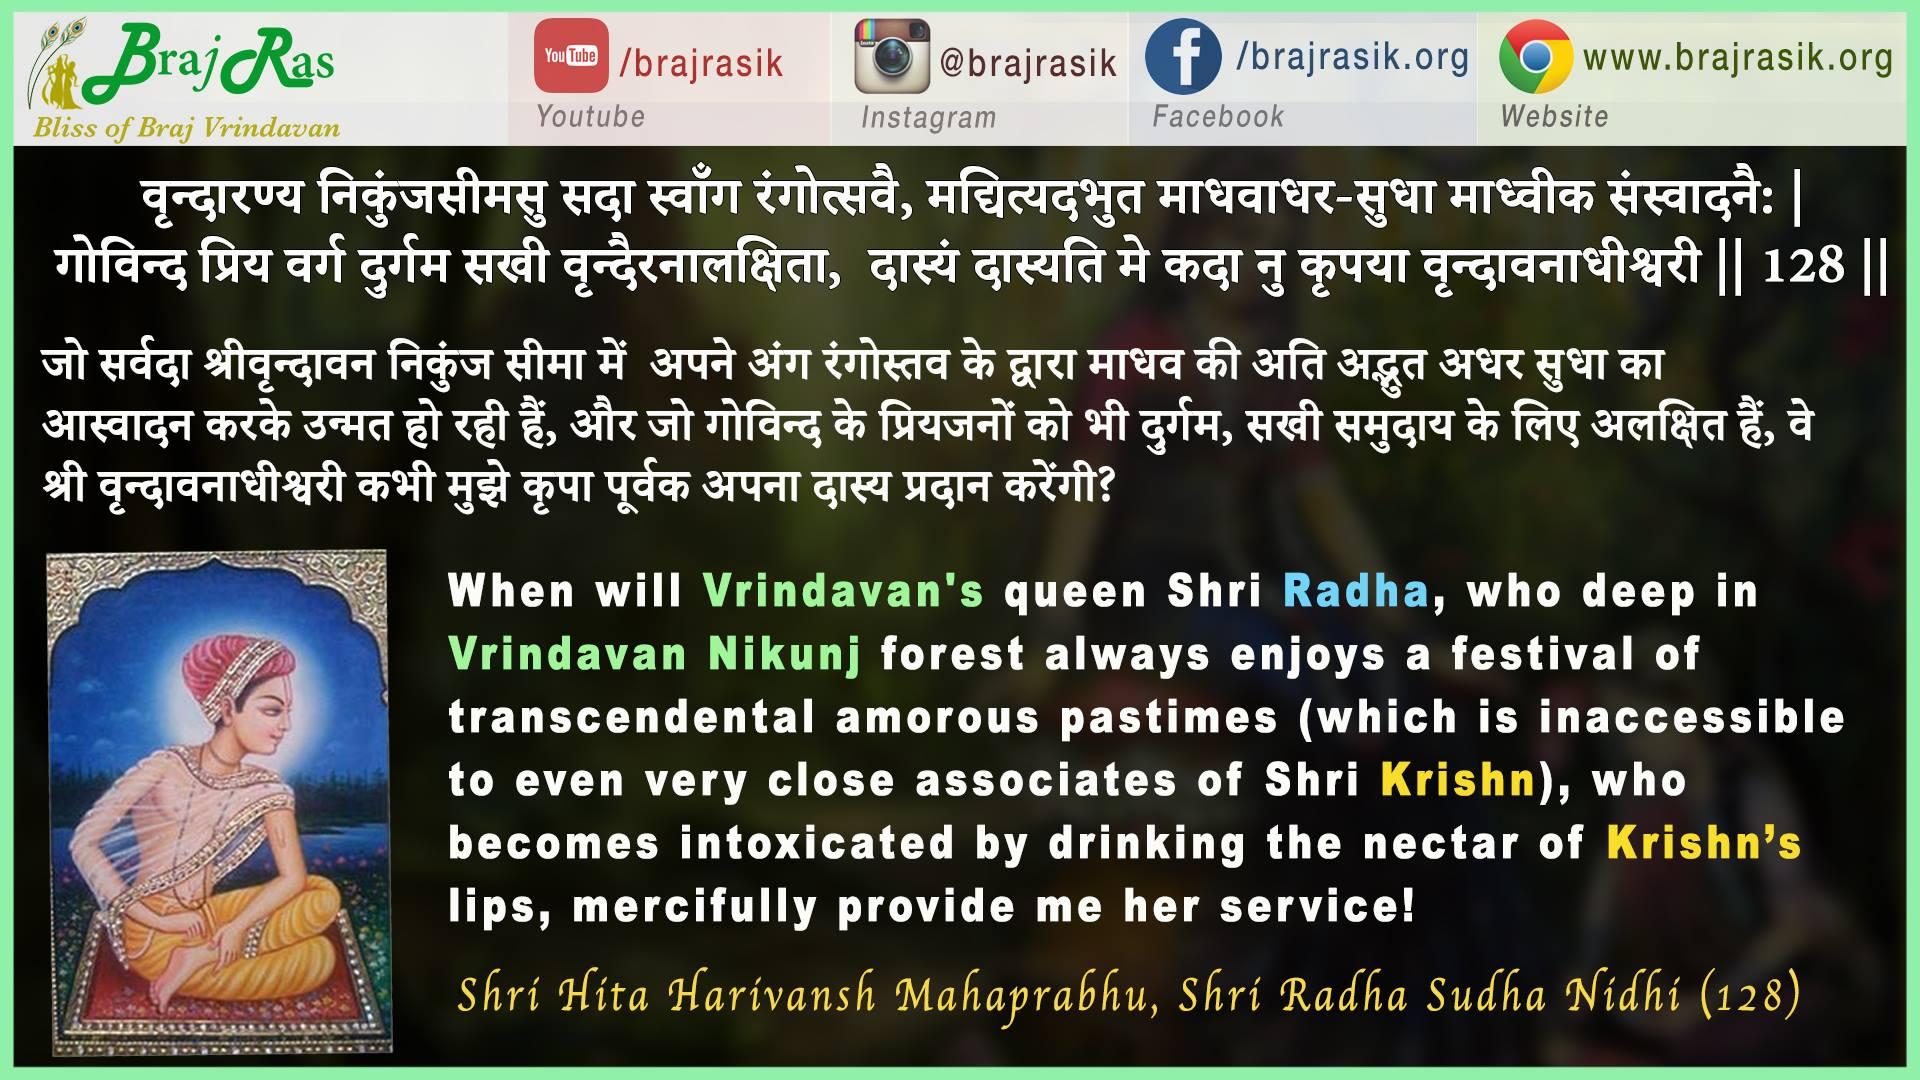 Vrindaranya Nikunjseemsu Sada Swaang rangotsava - Murali Avtar Shri Hita Harivansh Mahaprabhu, Shri Radha Sudha Nidhi